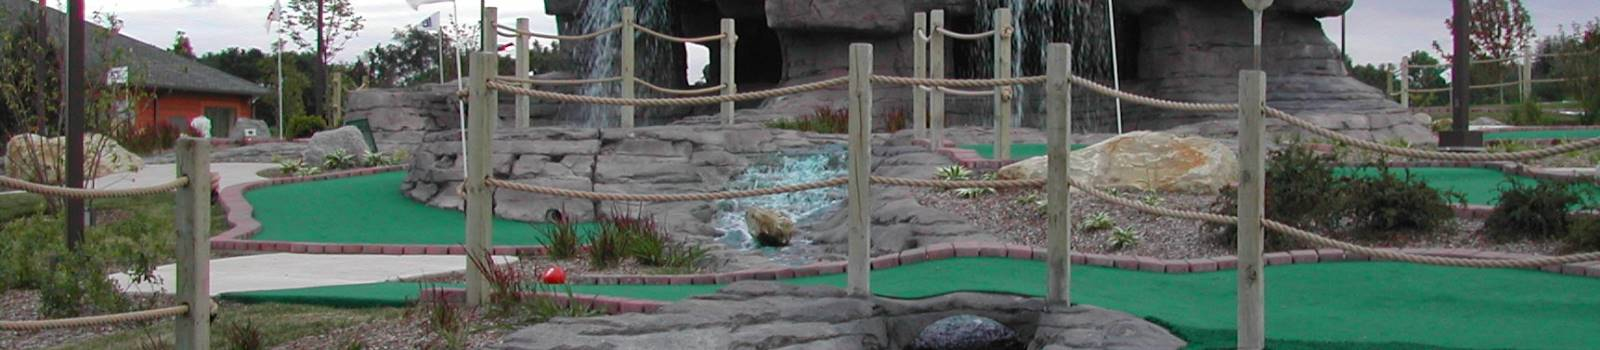 hole 6 mini golf course design